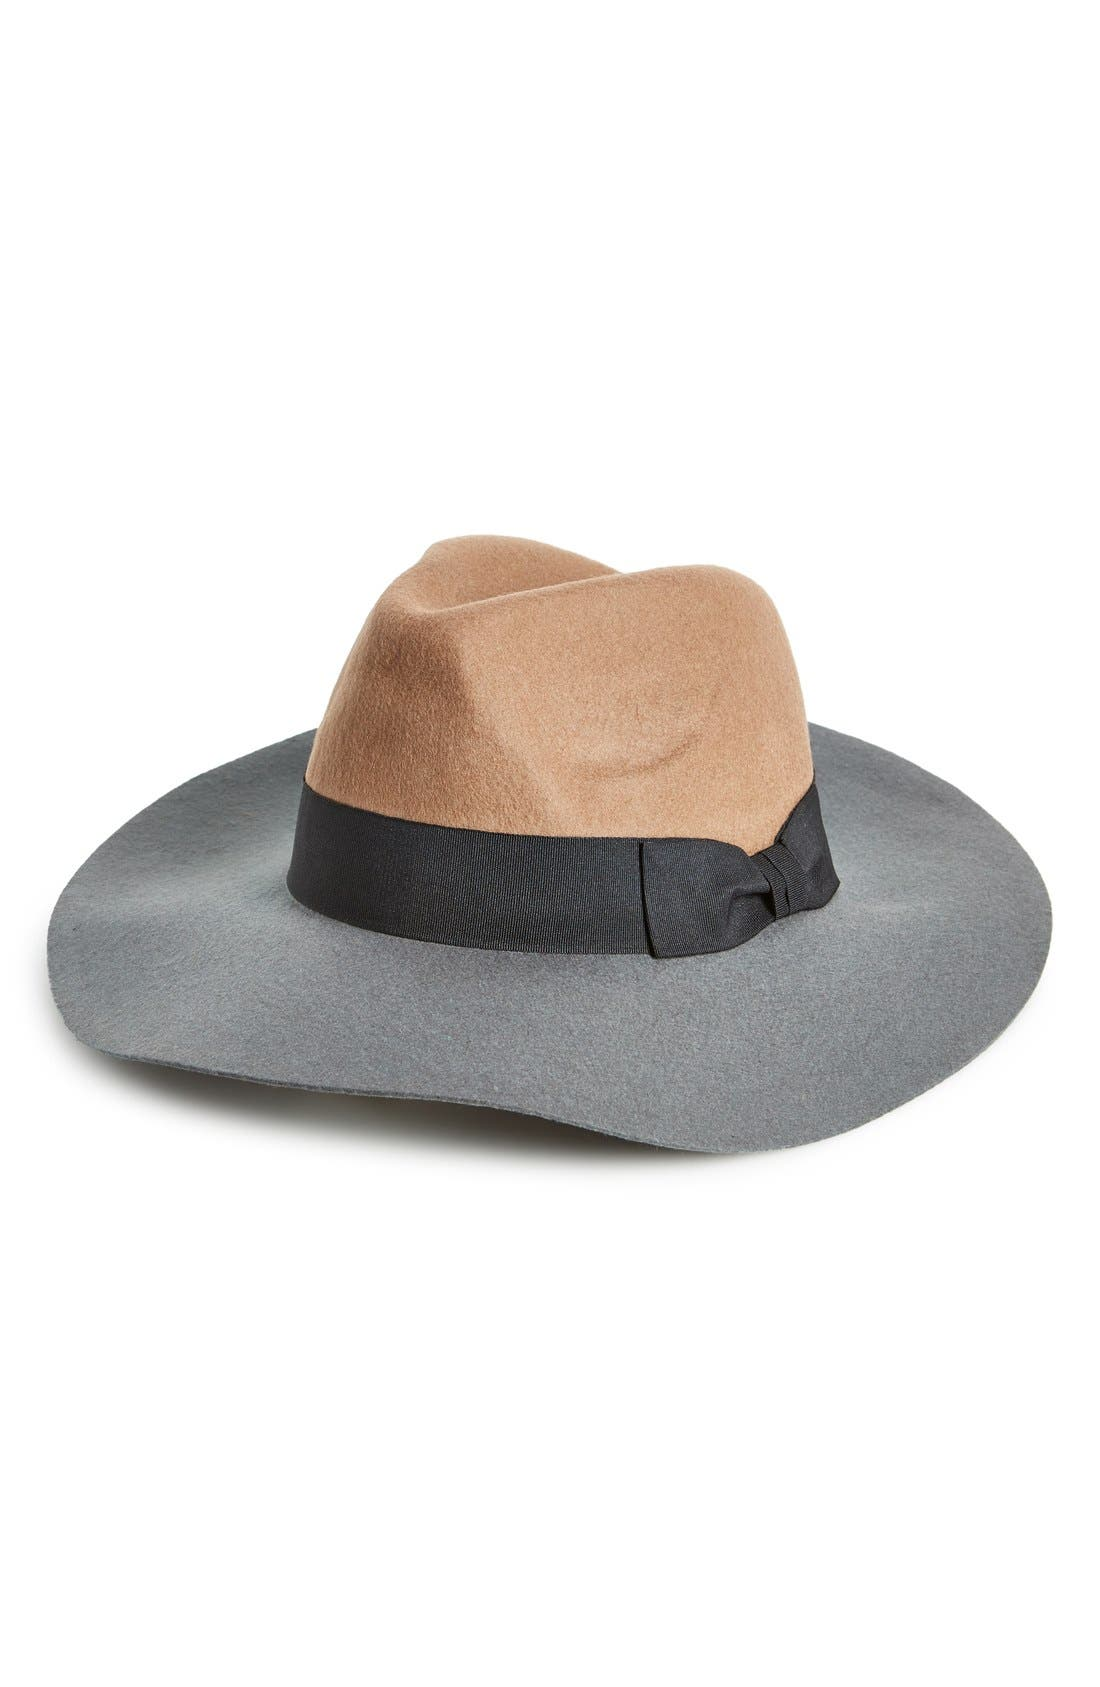 Alternate Image 1 Selected - BCBGeneration Colorblock Panama Hat